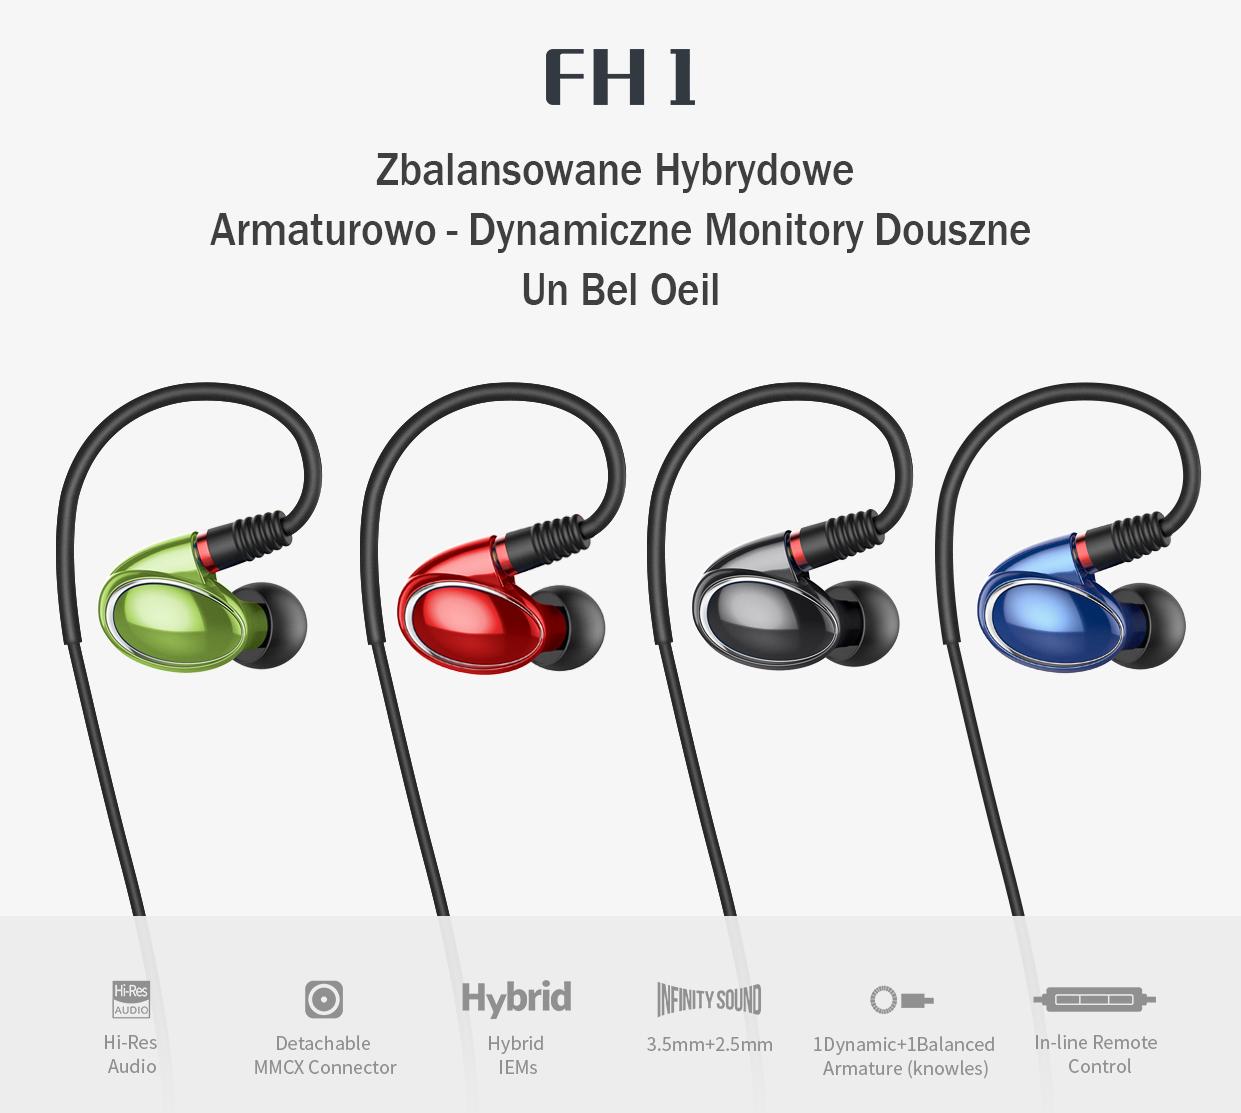 fh1 monitory douszne